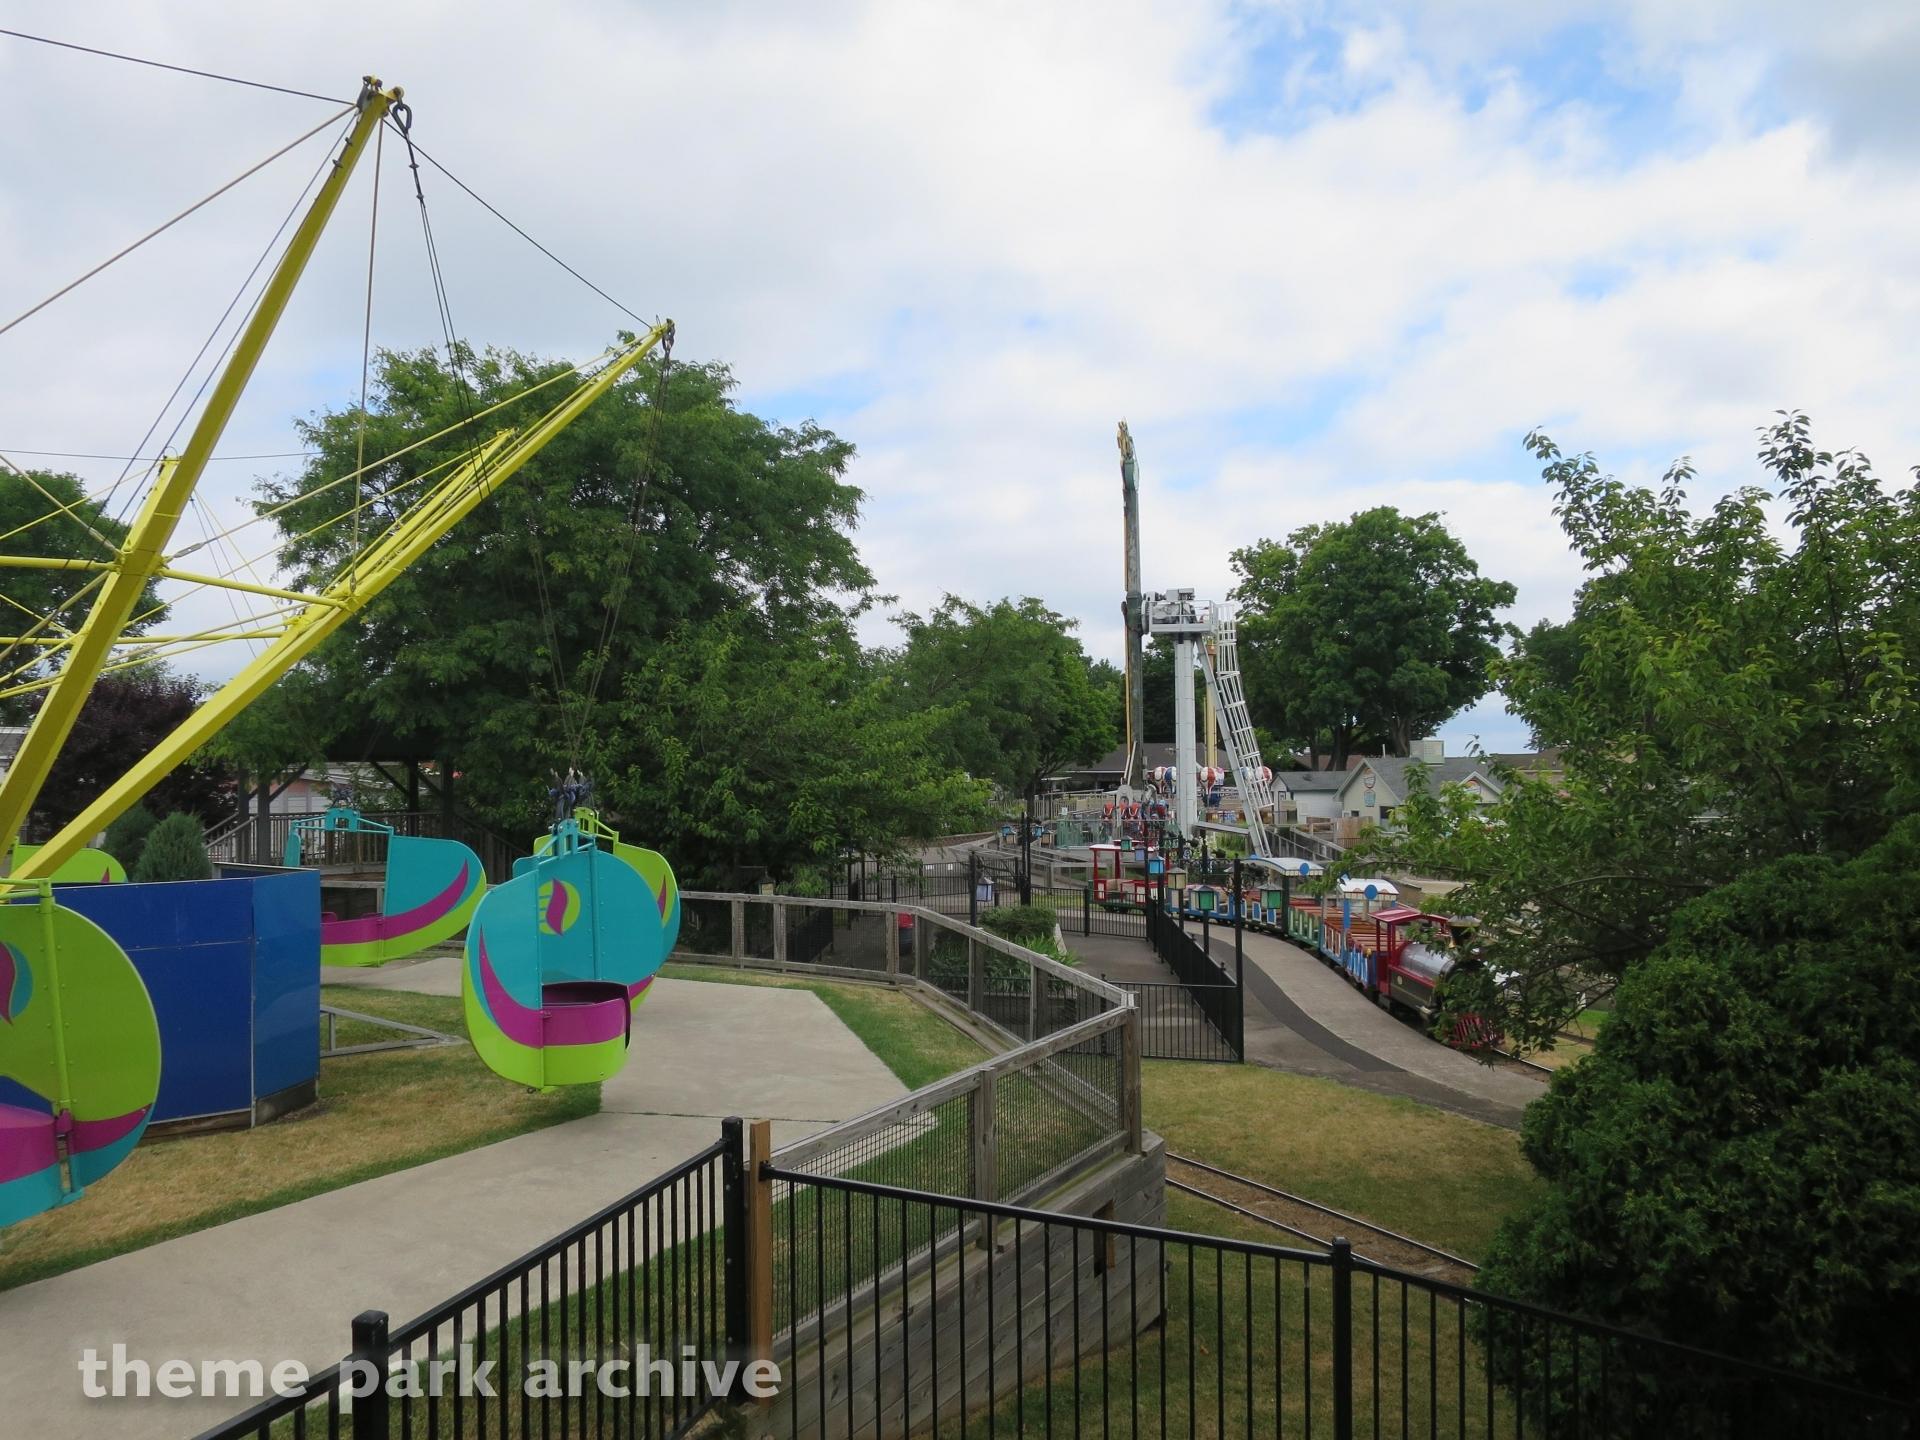 Scenic Train at Seabreeze Amusement Park